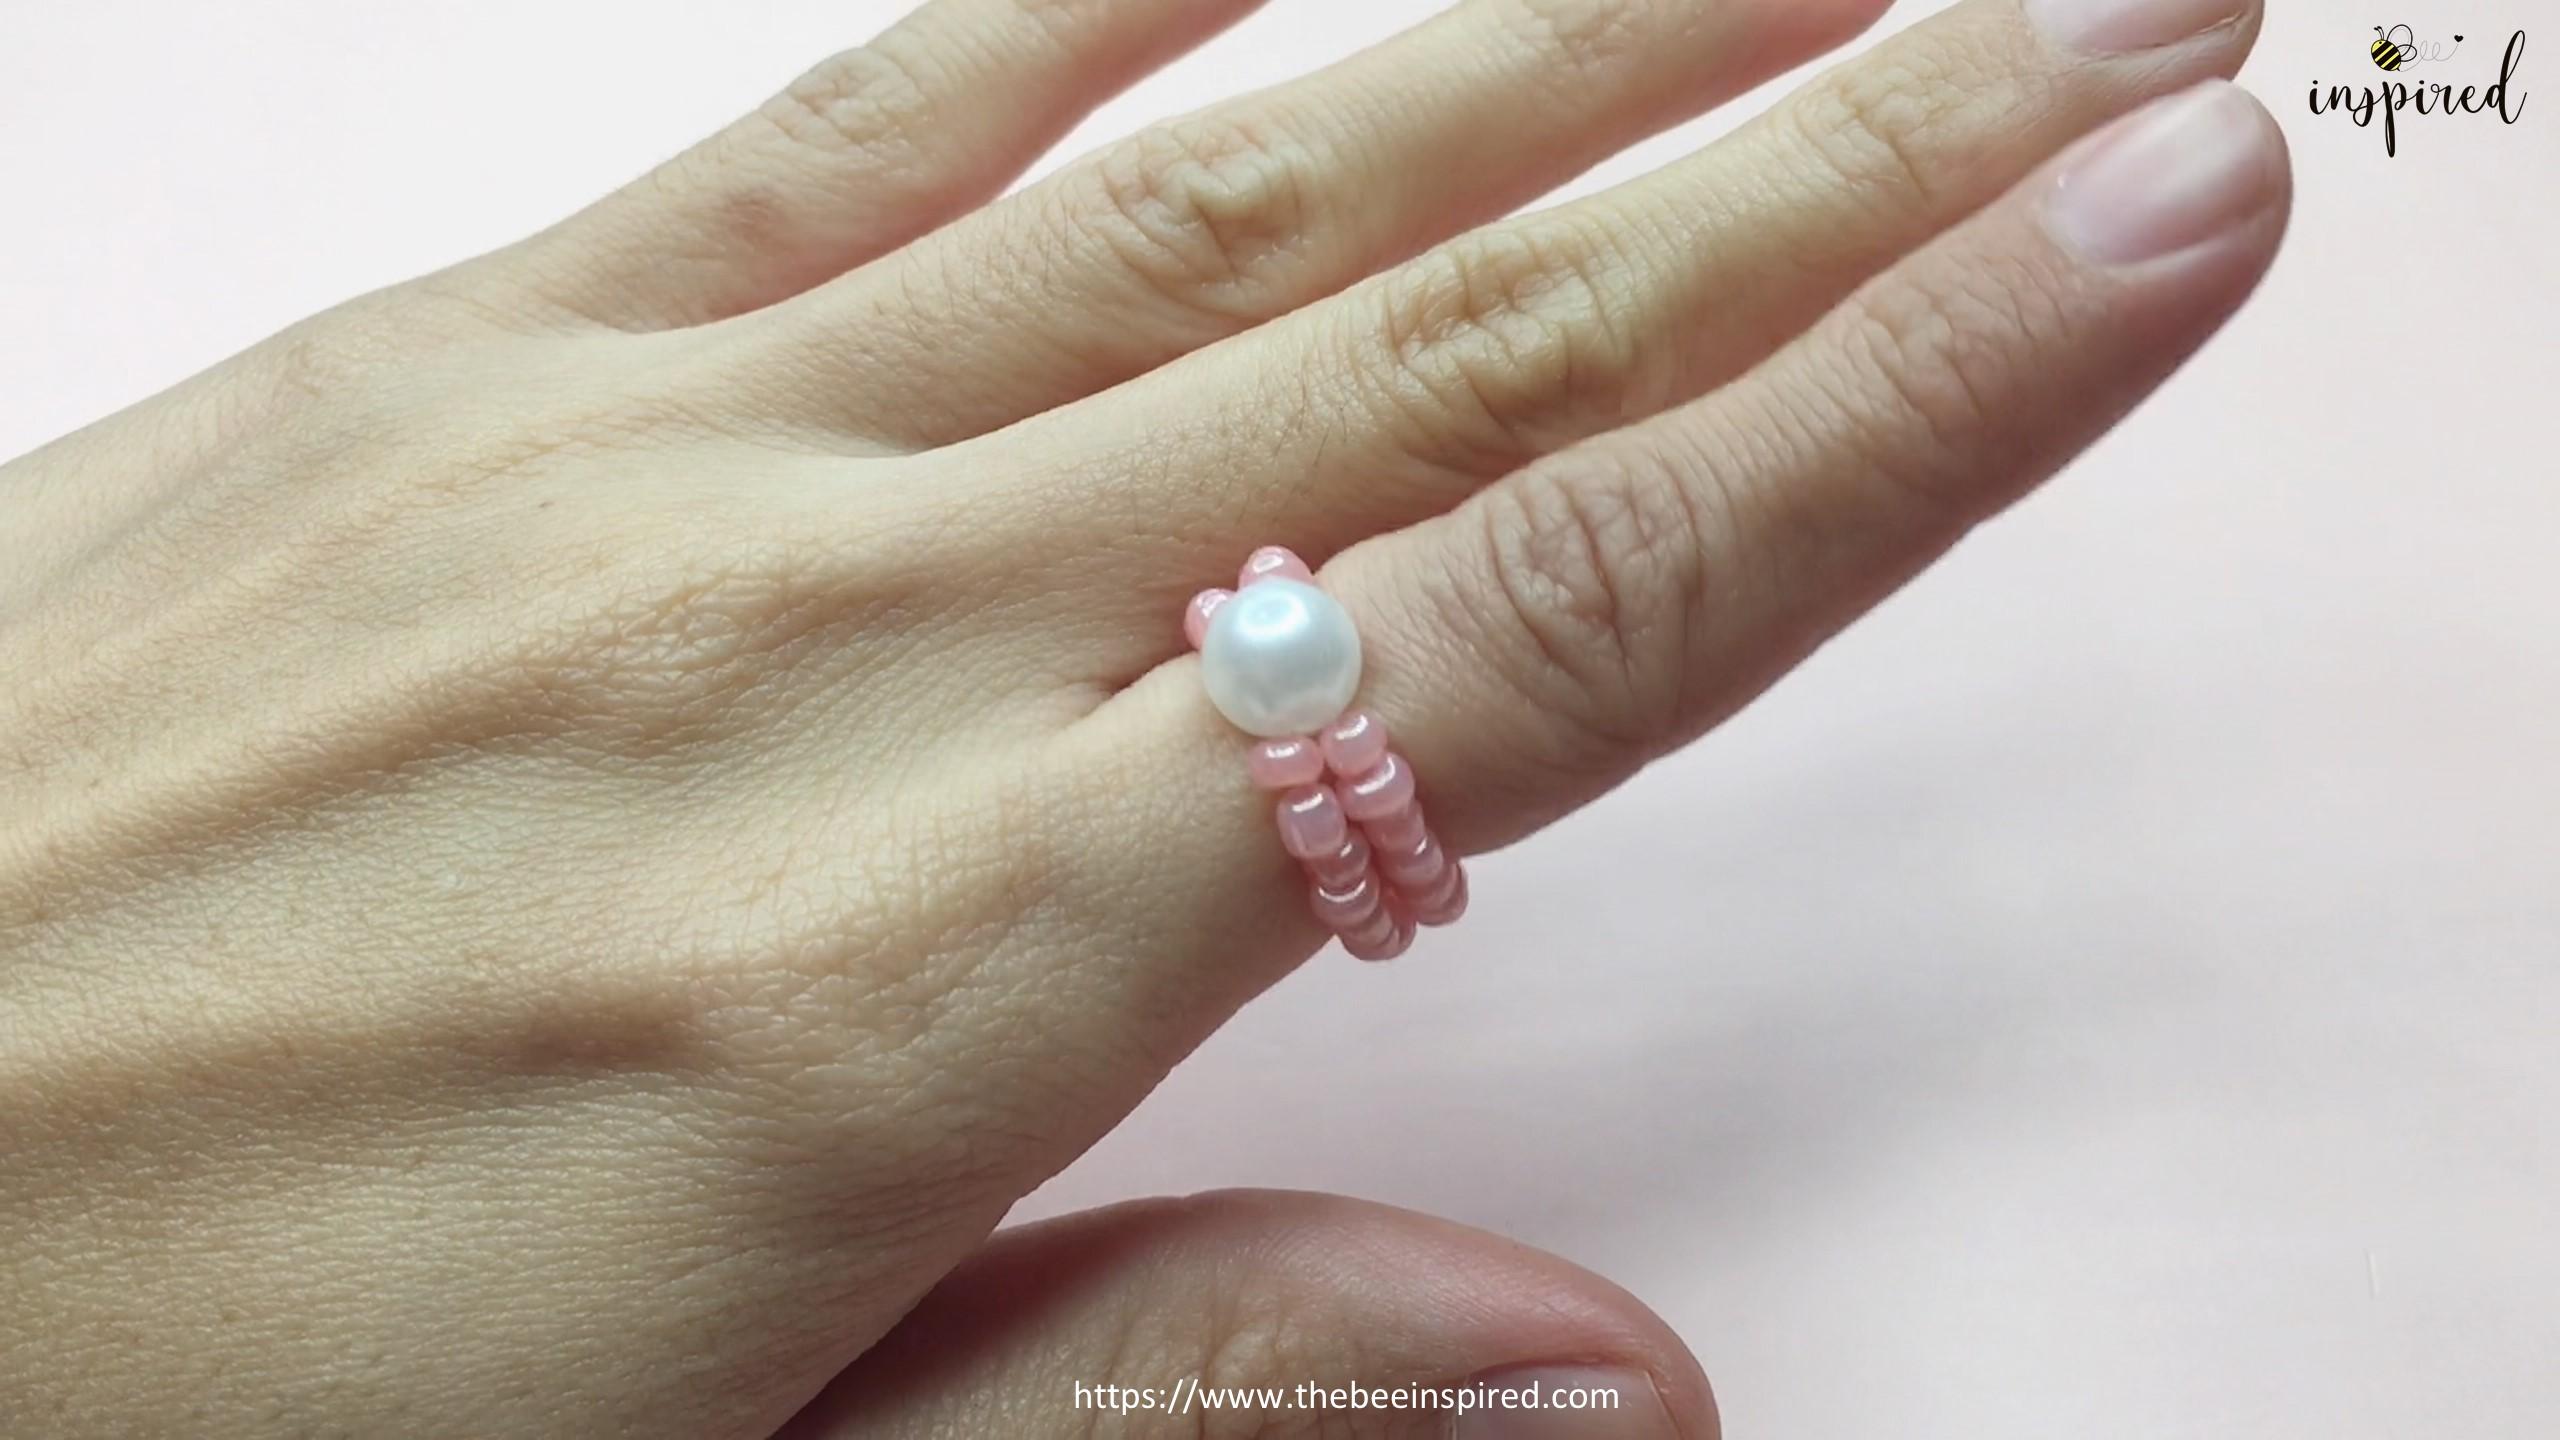 Easy DIY Beaded Ring วิธีทำแหวนลูกปัดง่ายๆ สไตล์เกาหลี_20